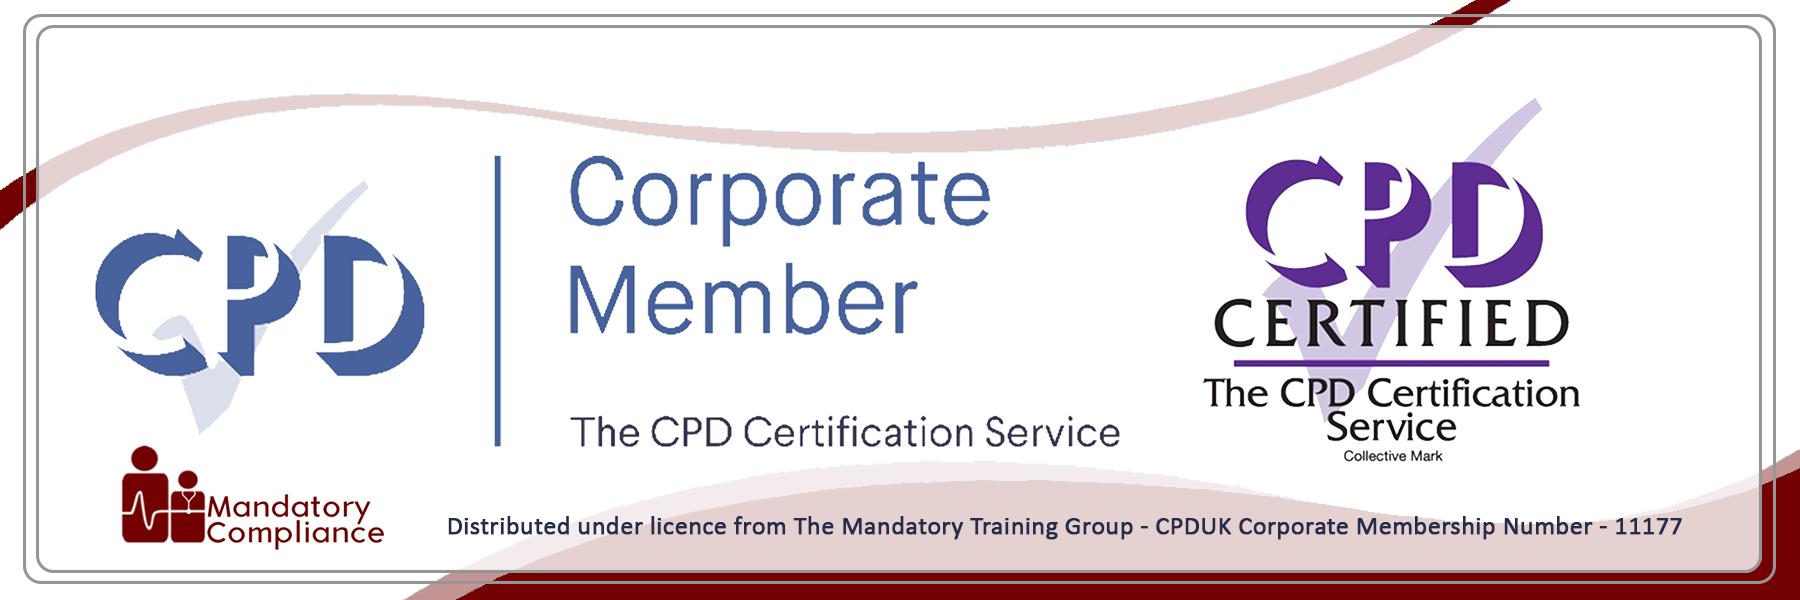 Safeguarding Legislation - Online Training Course - CPD Accredited - Mandatory Compliance UK -